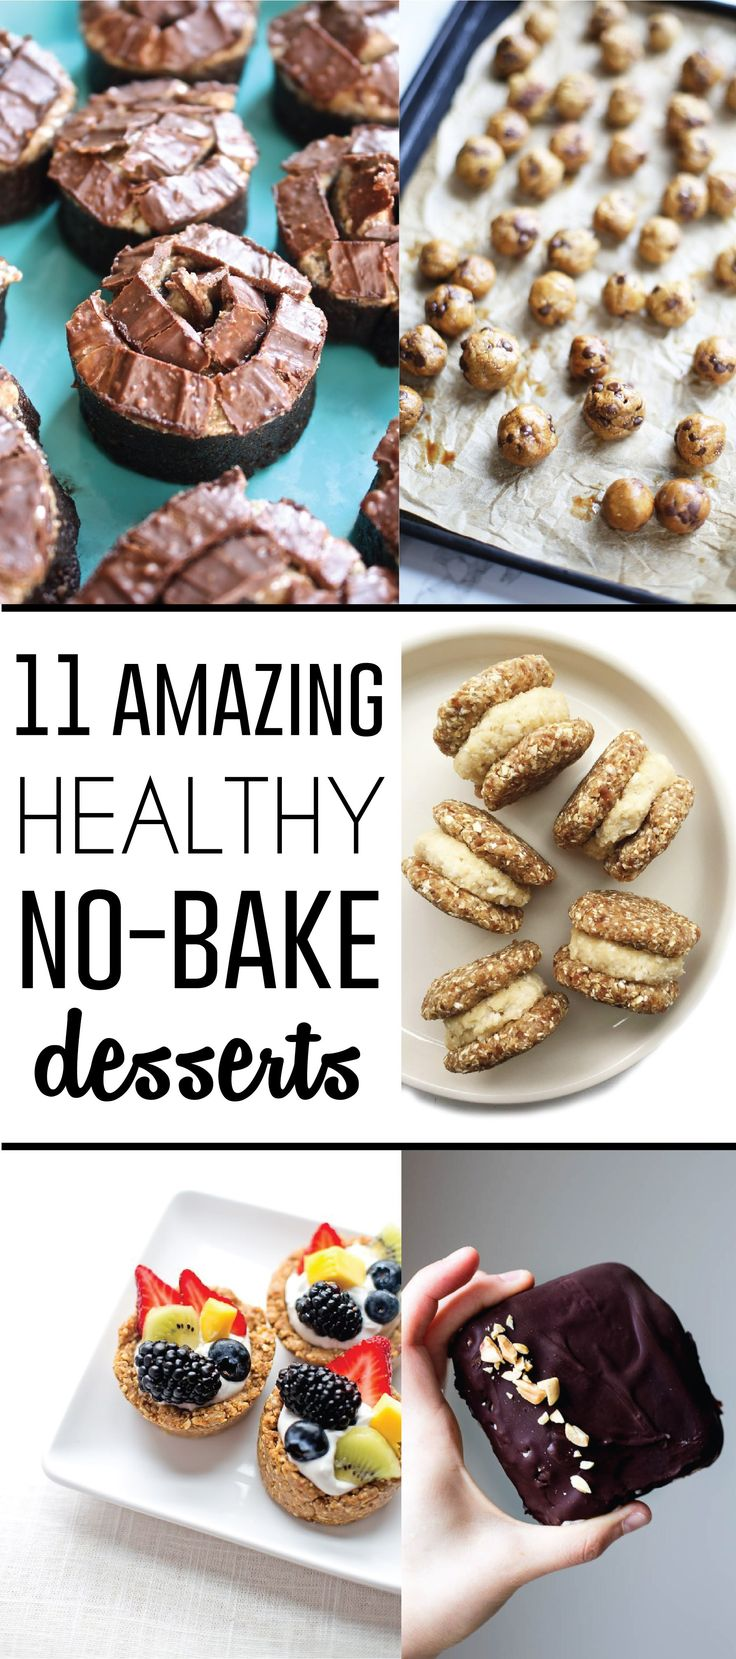 11 amazing & healthy no-bake dessert recipes!